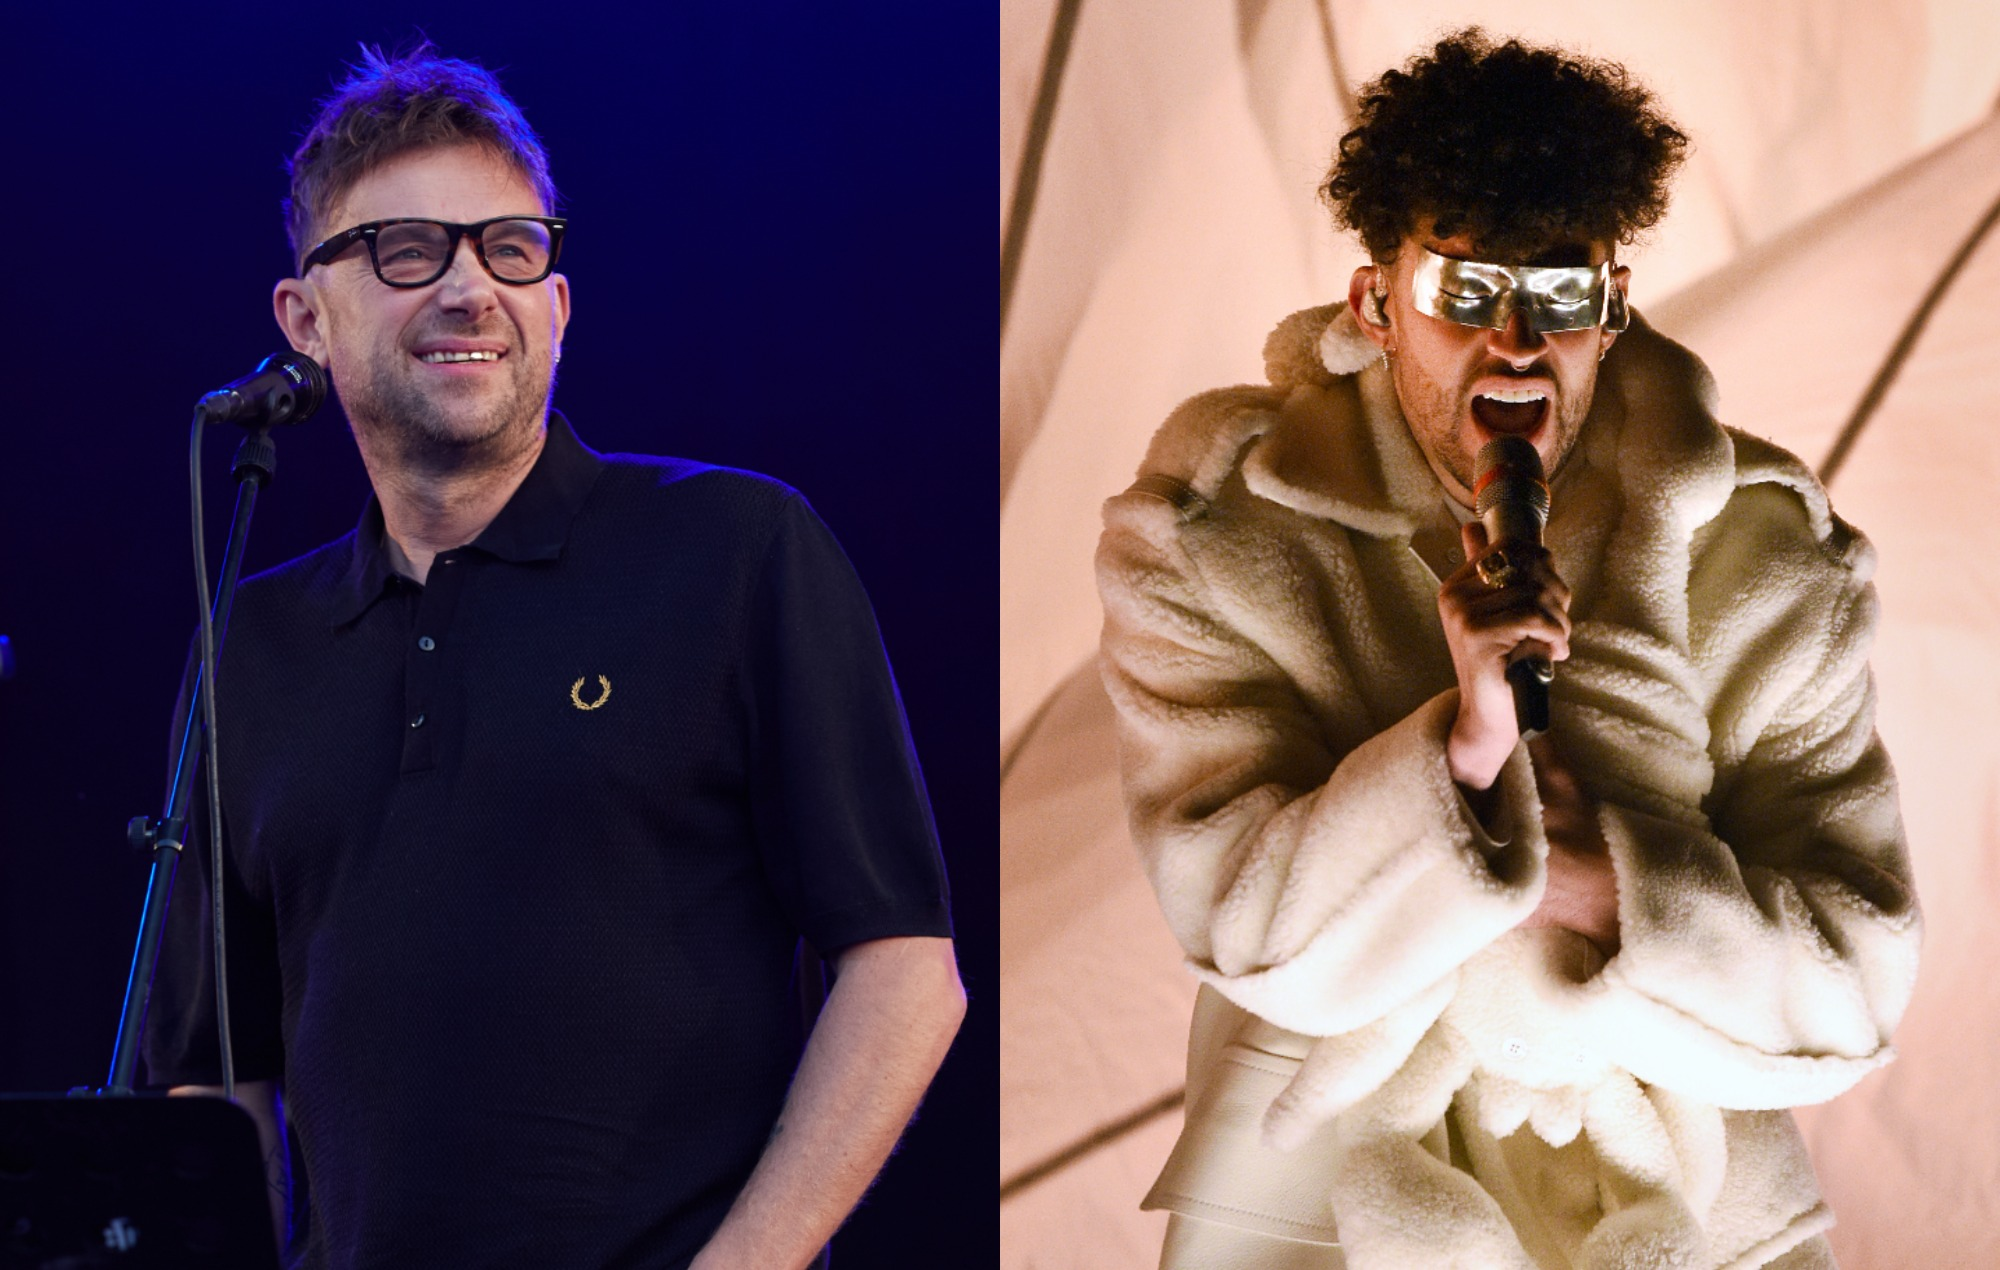 Damon Albarn confirms Gorillaz collaboration with Bad Bunny